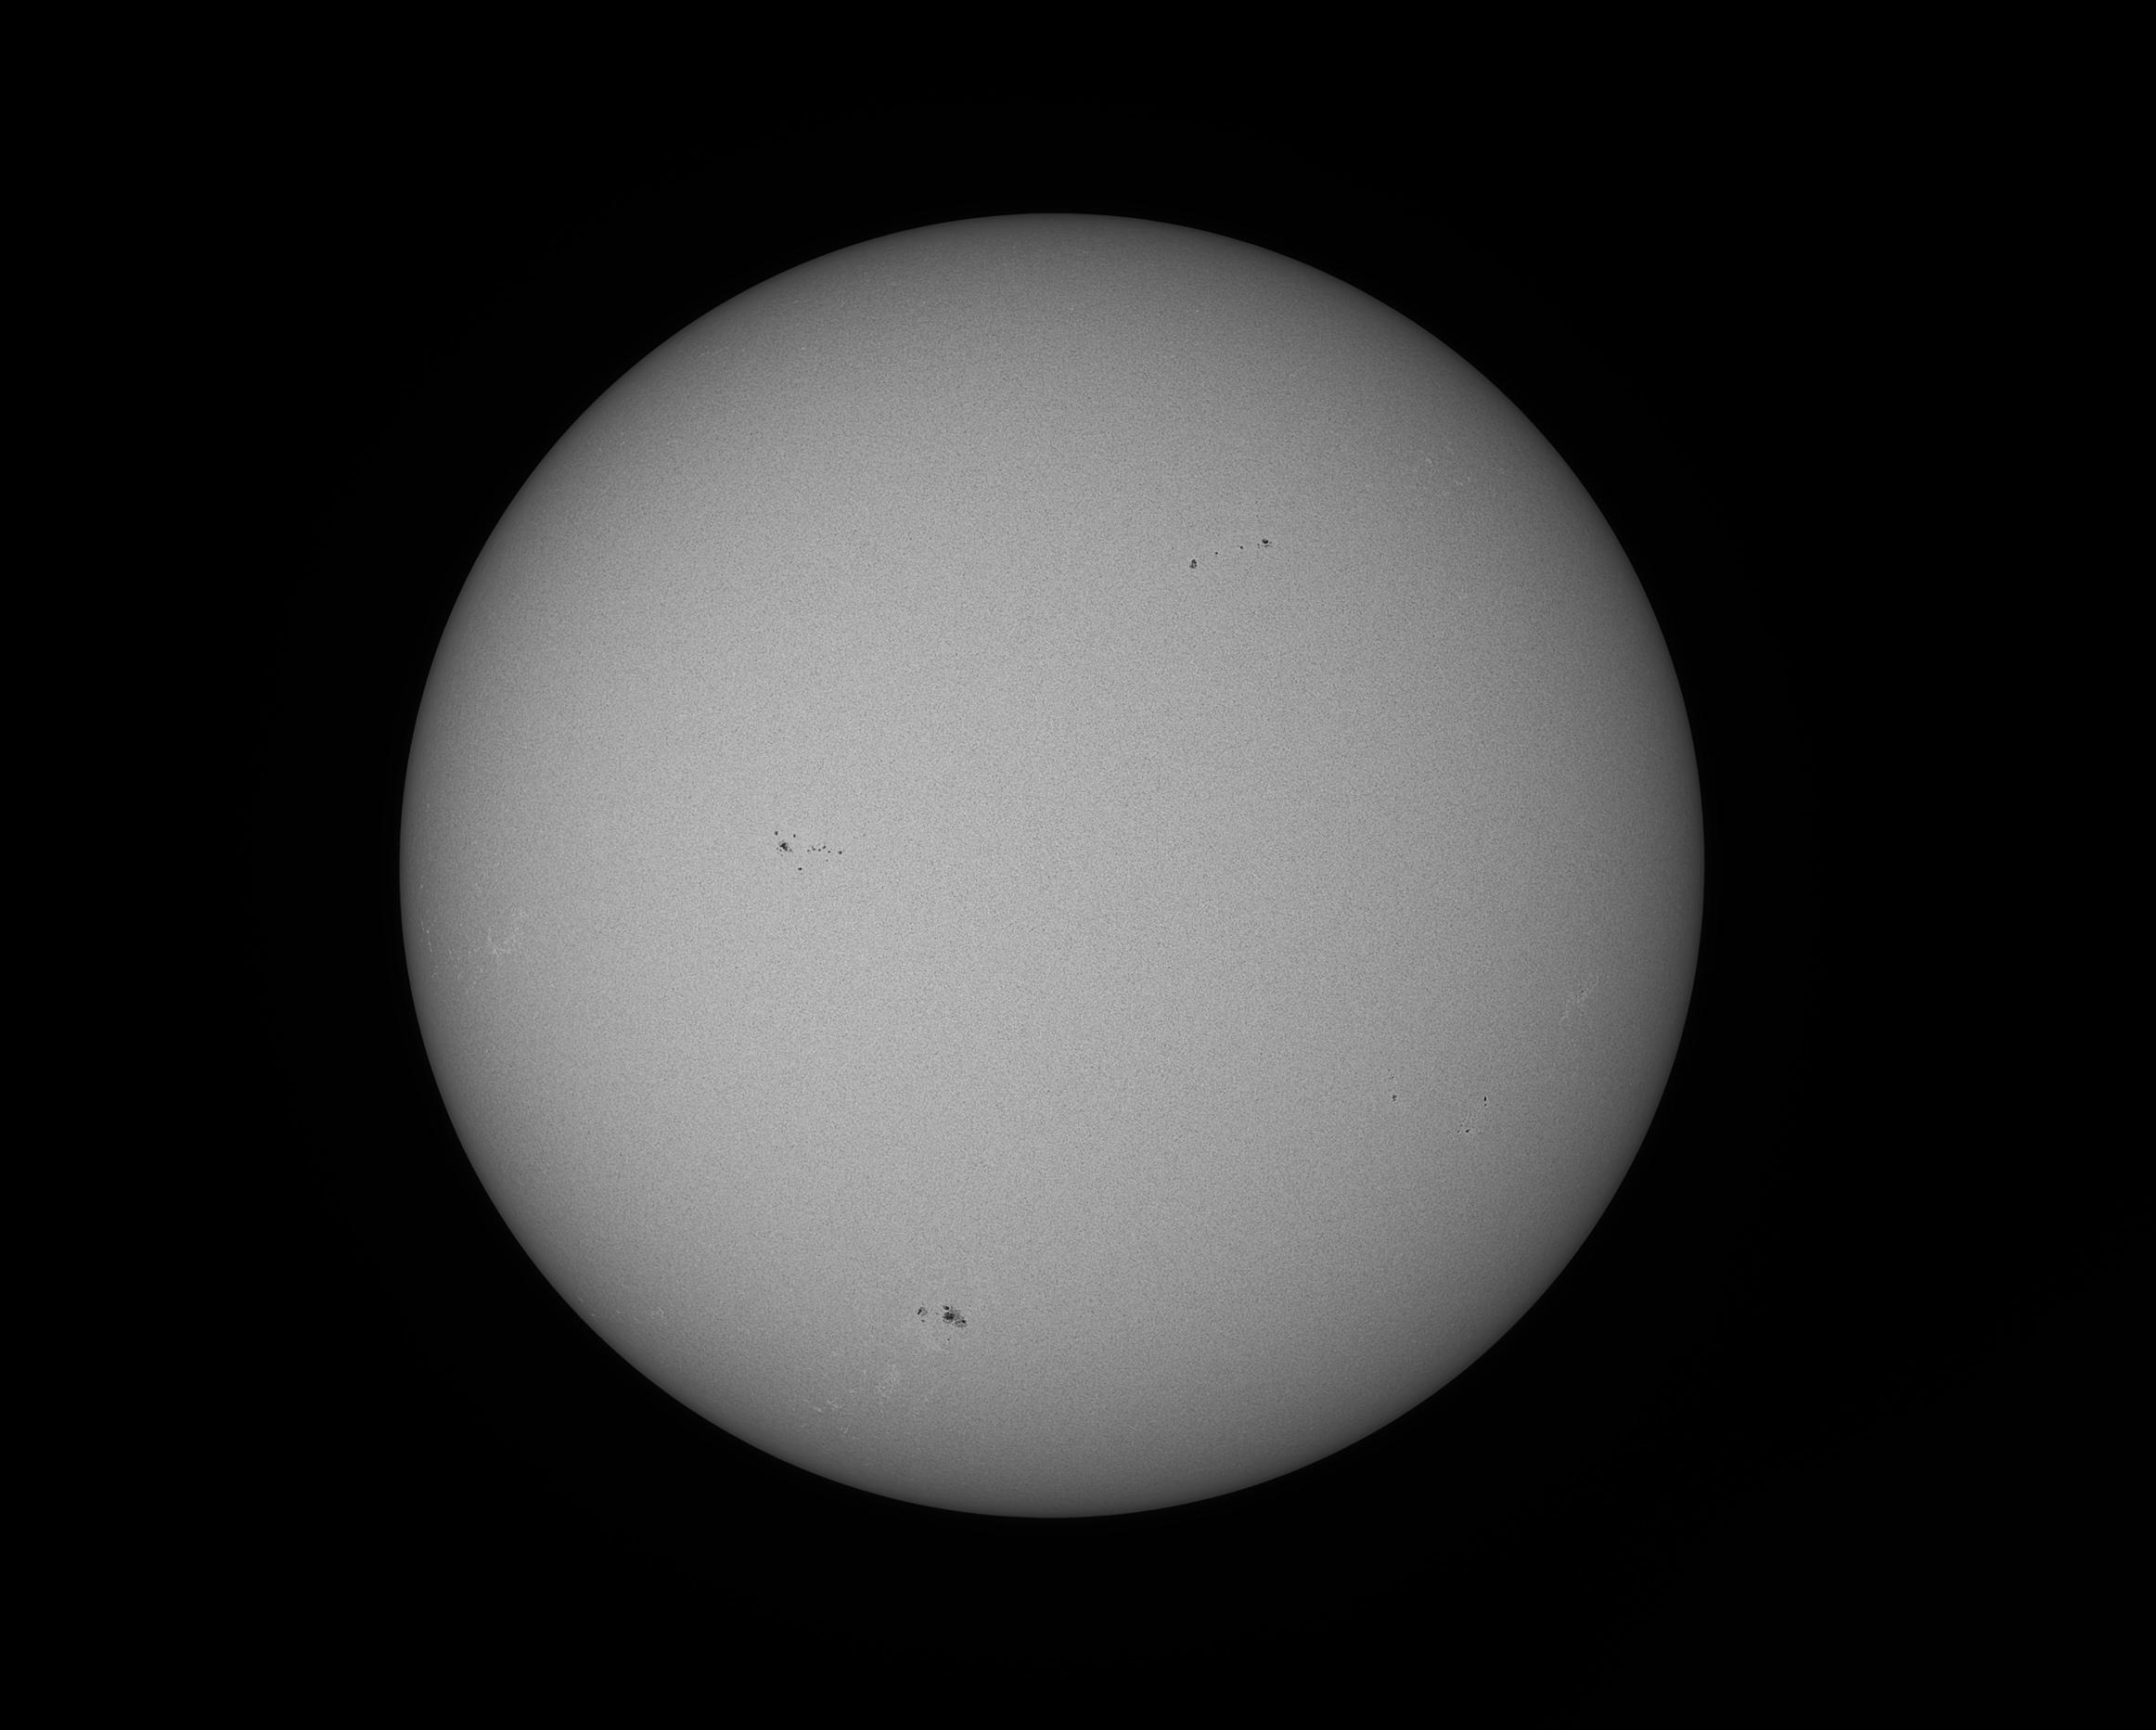 S20210922-16h07UT-fs60-helioTS-gpx1.7-as